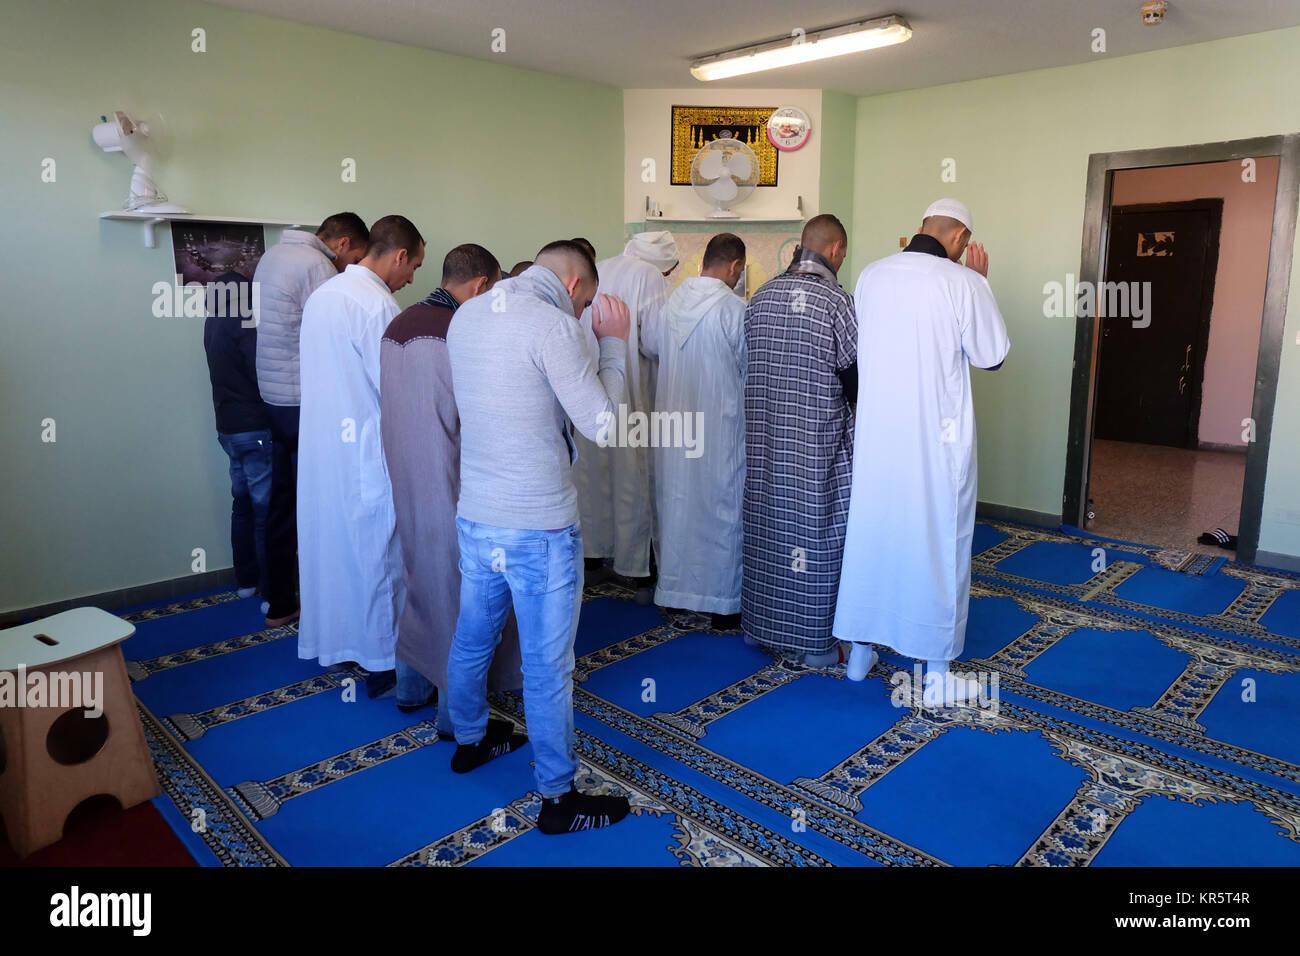 Milan, Italy  14th Dec, 2017  Muslim prisoners pray inside a